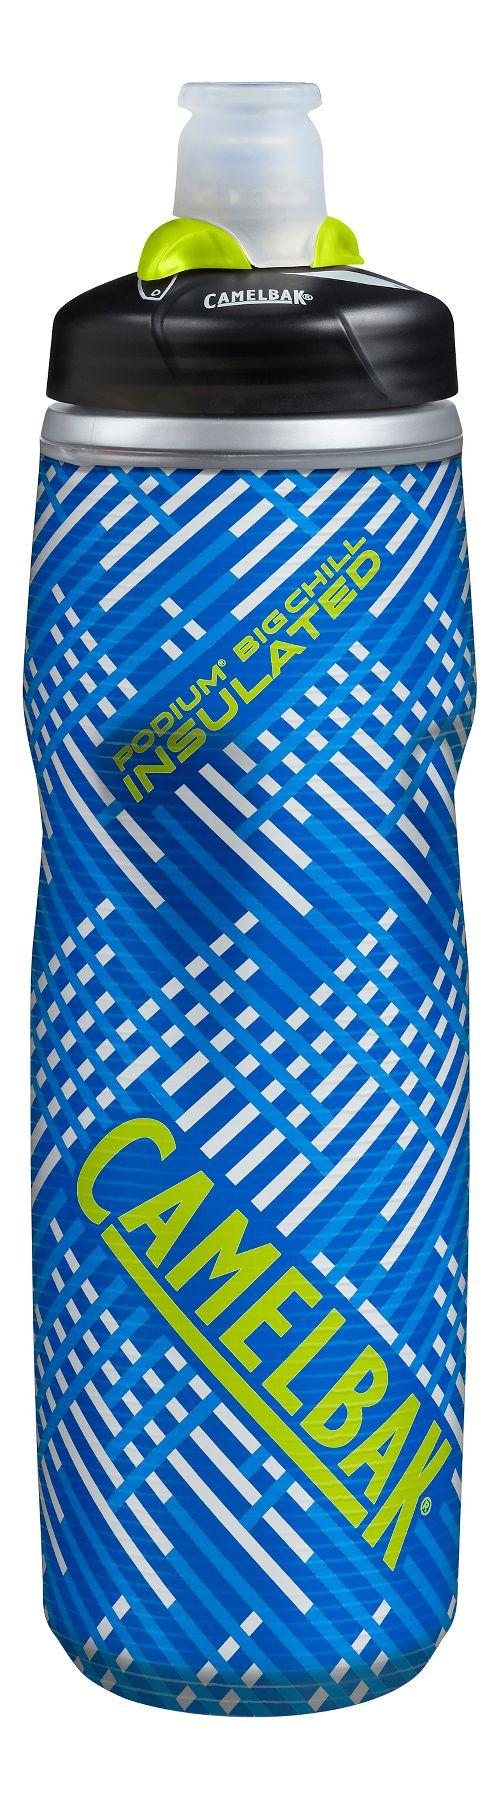 Camelbak Podium Big Chill 25 ounce Bottle Hydration - Cayman